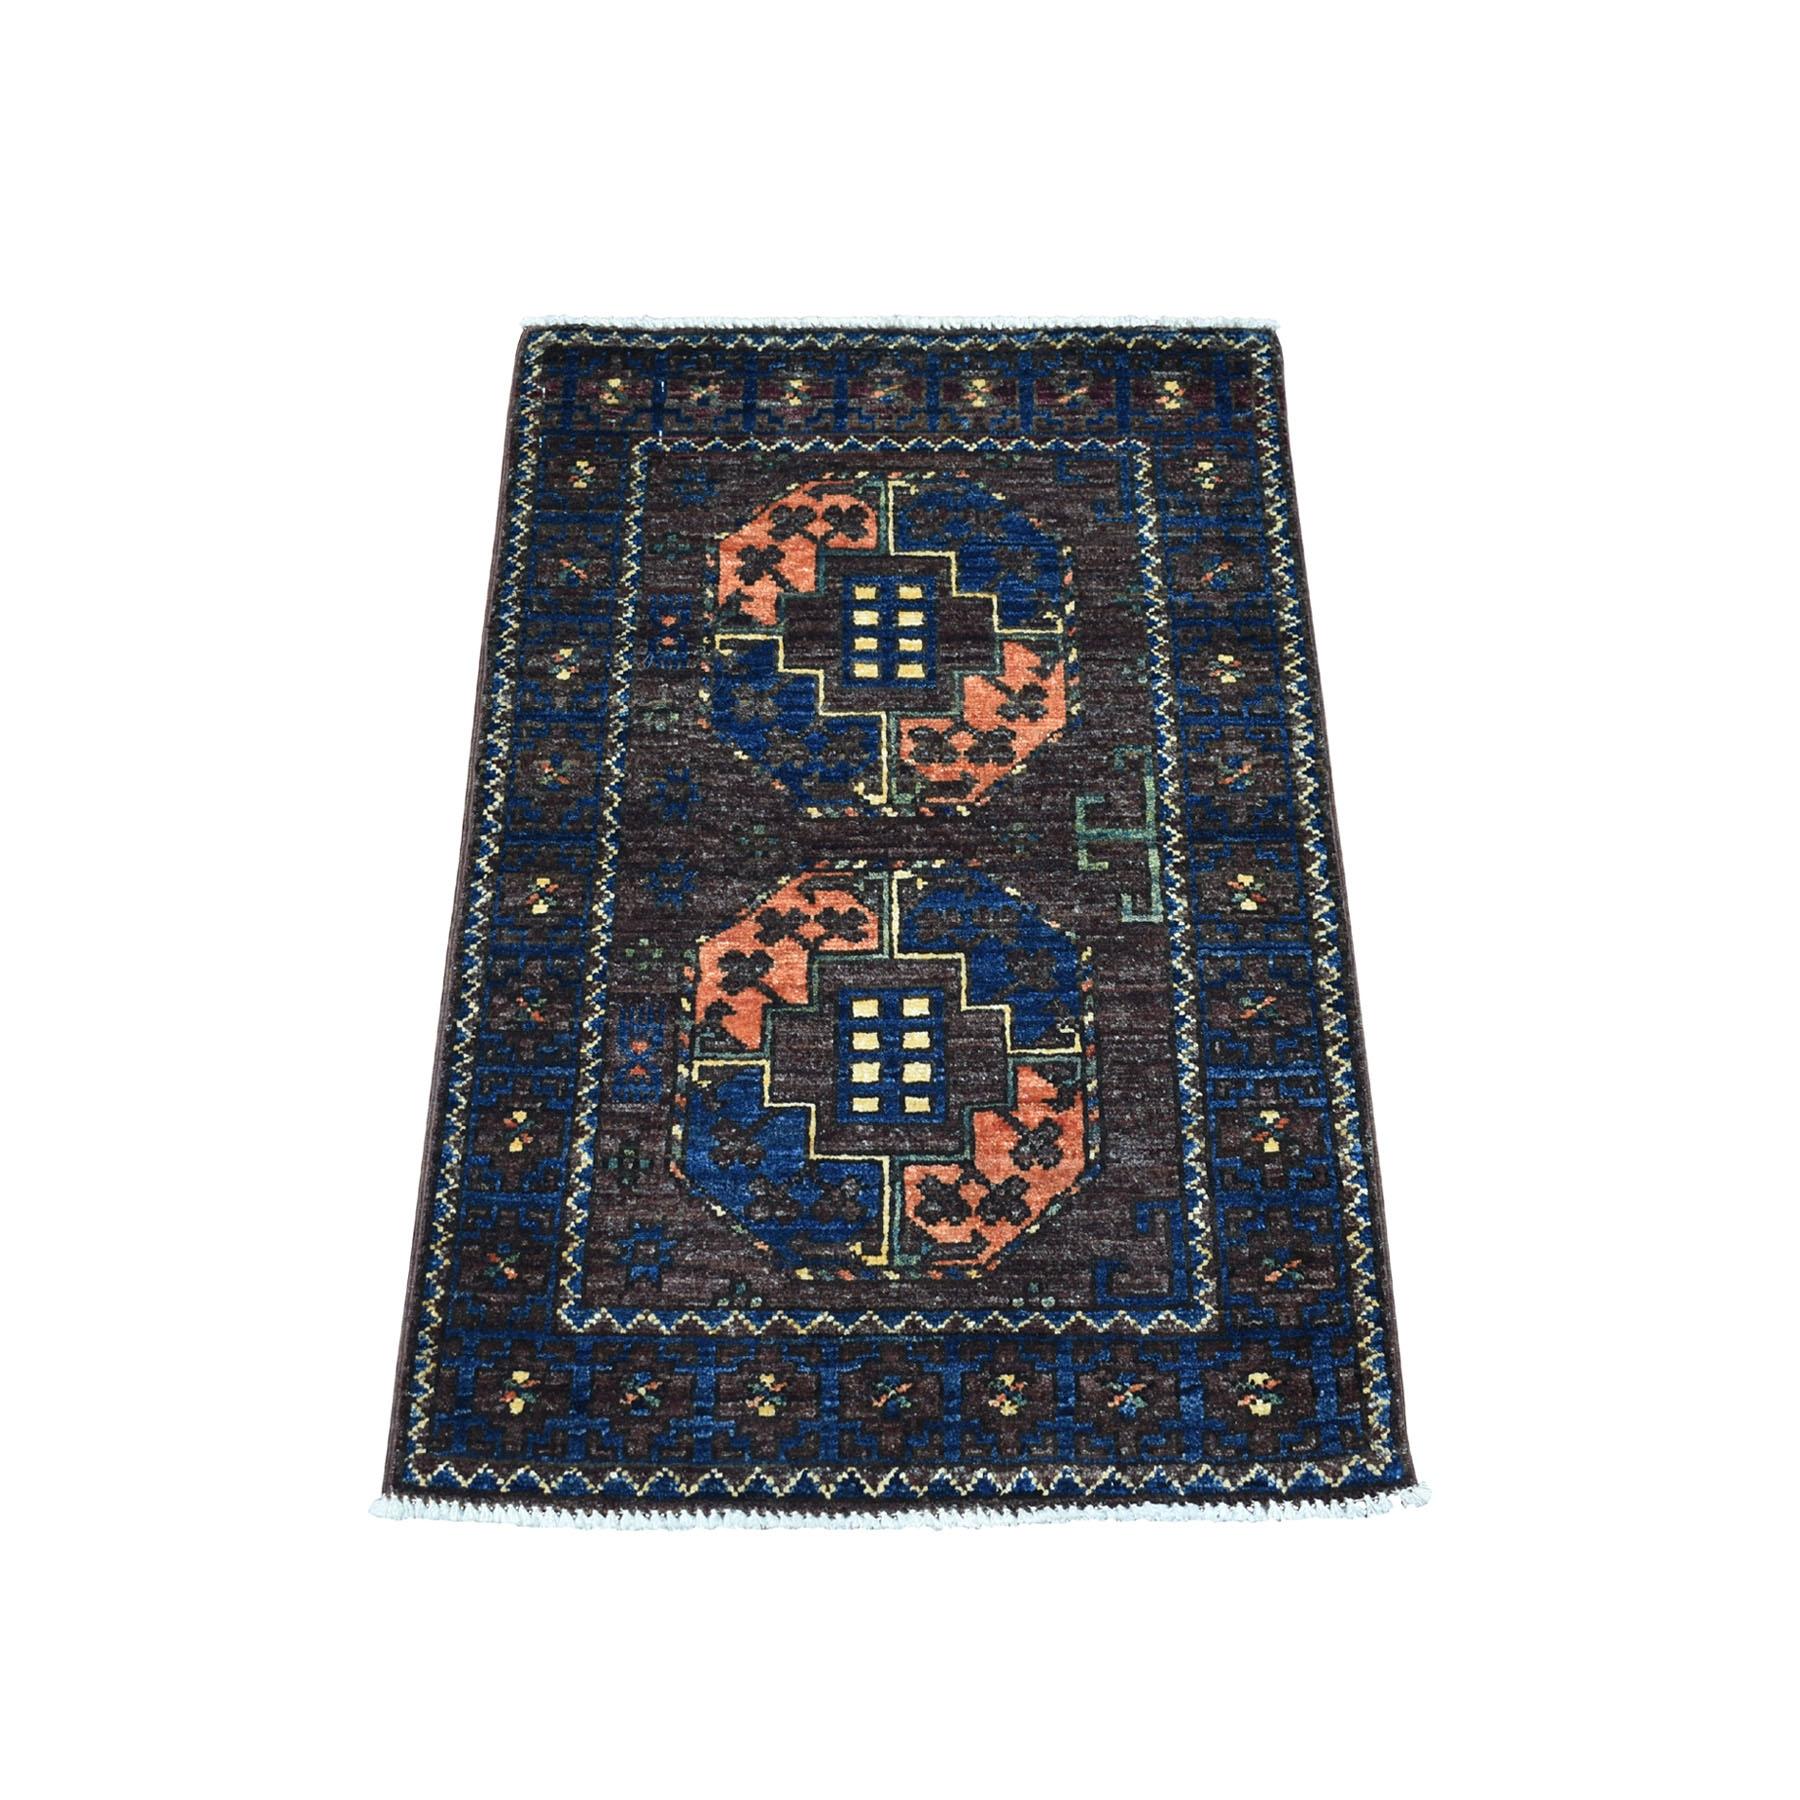 2'X3' Elephant Feet Design Afghan Ersari Hand Knotted Pure Wool Oriental Rug moaecb67